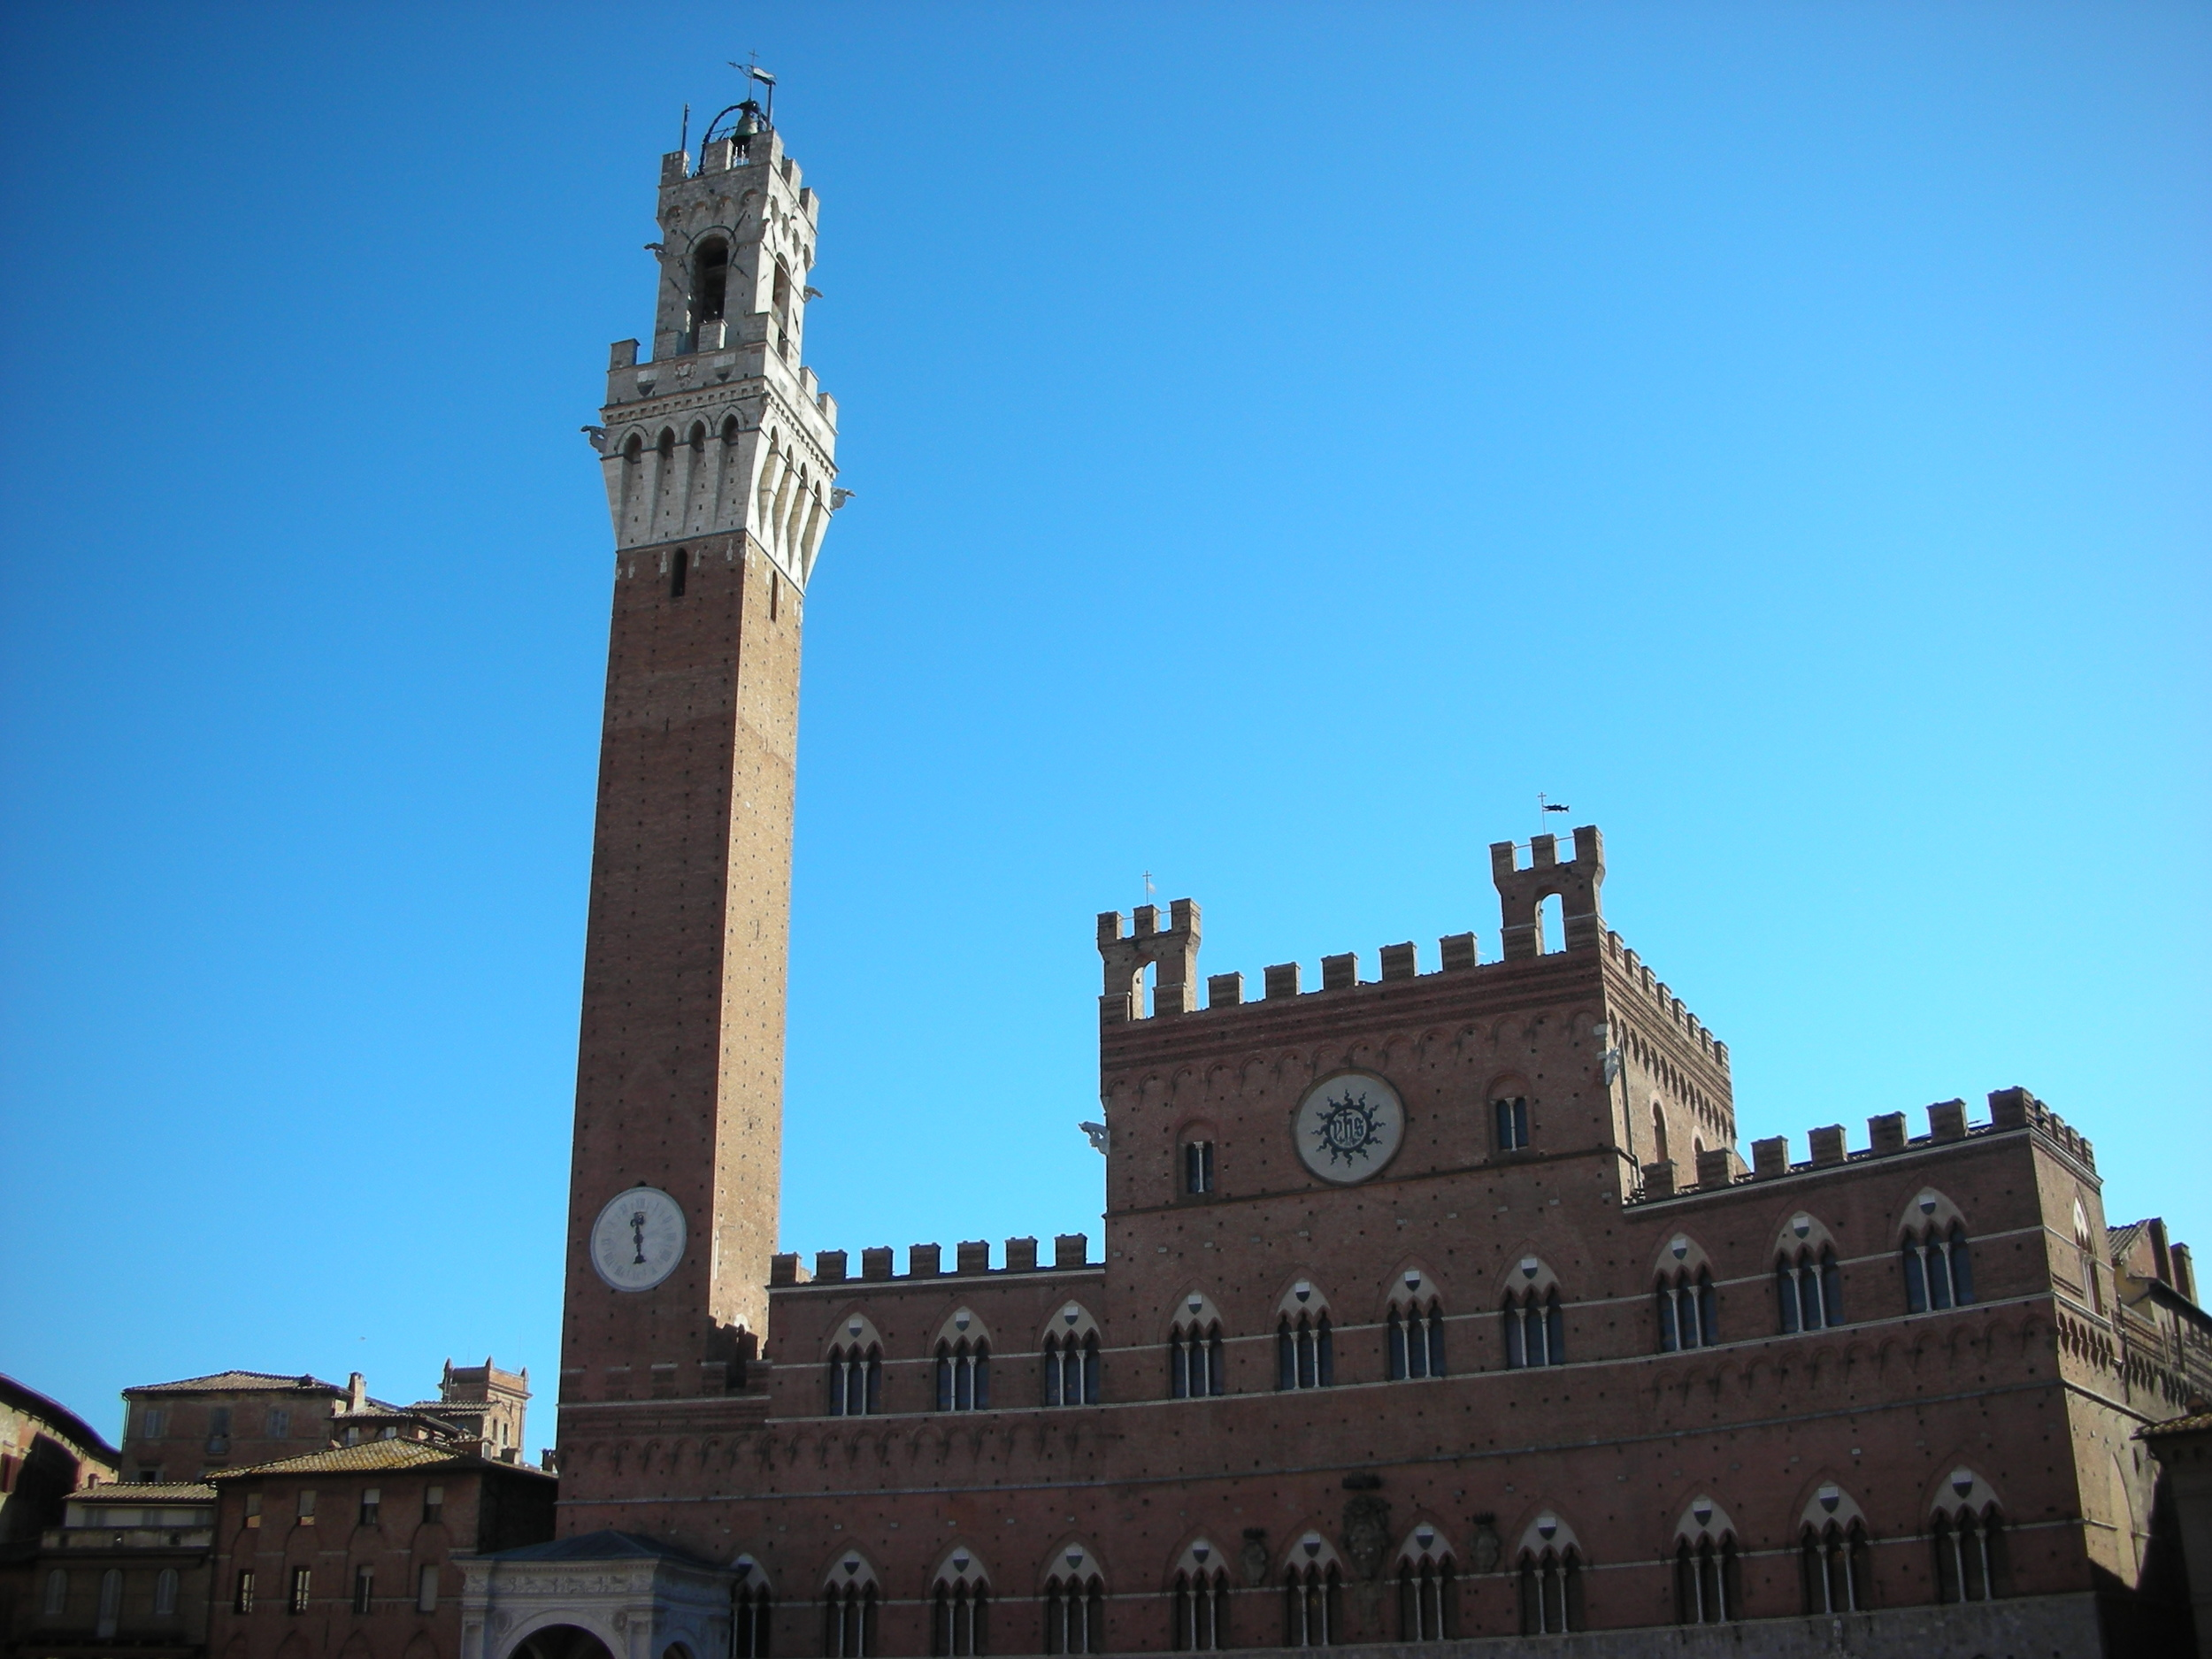 CRO Italy web 2007 - 09.JPG